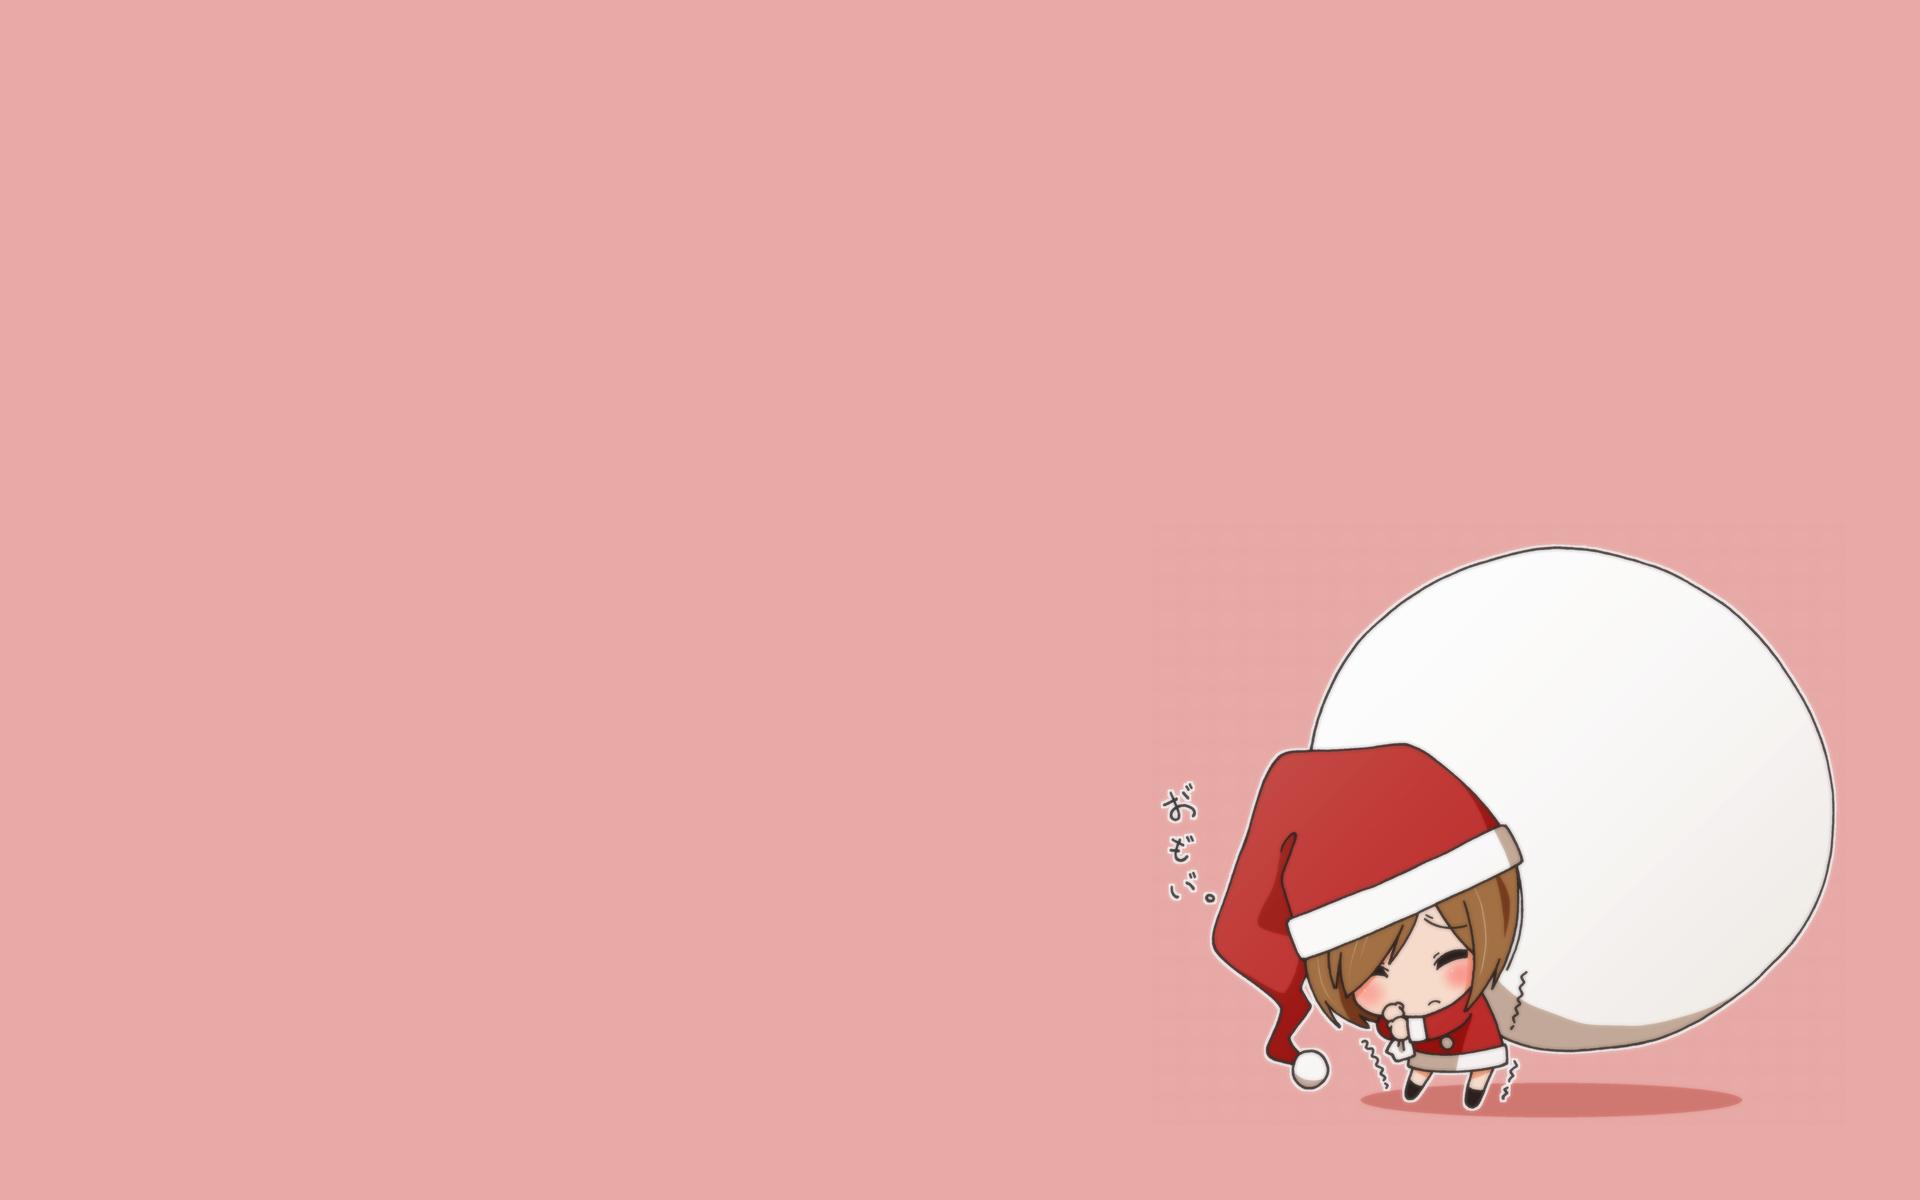 Anime Chibi Christmas wallpaper   296529 1920x1200